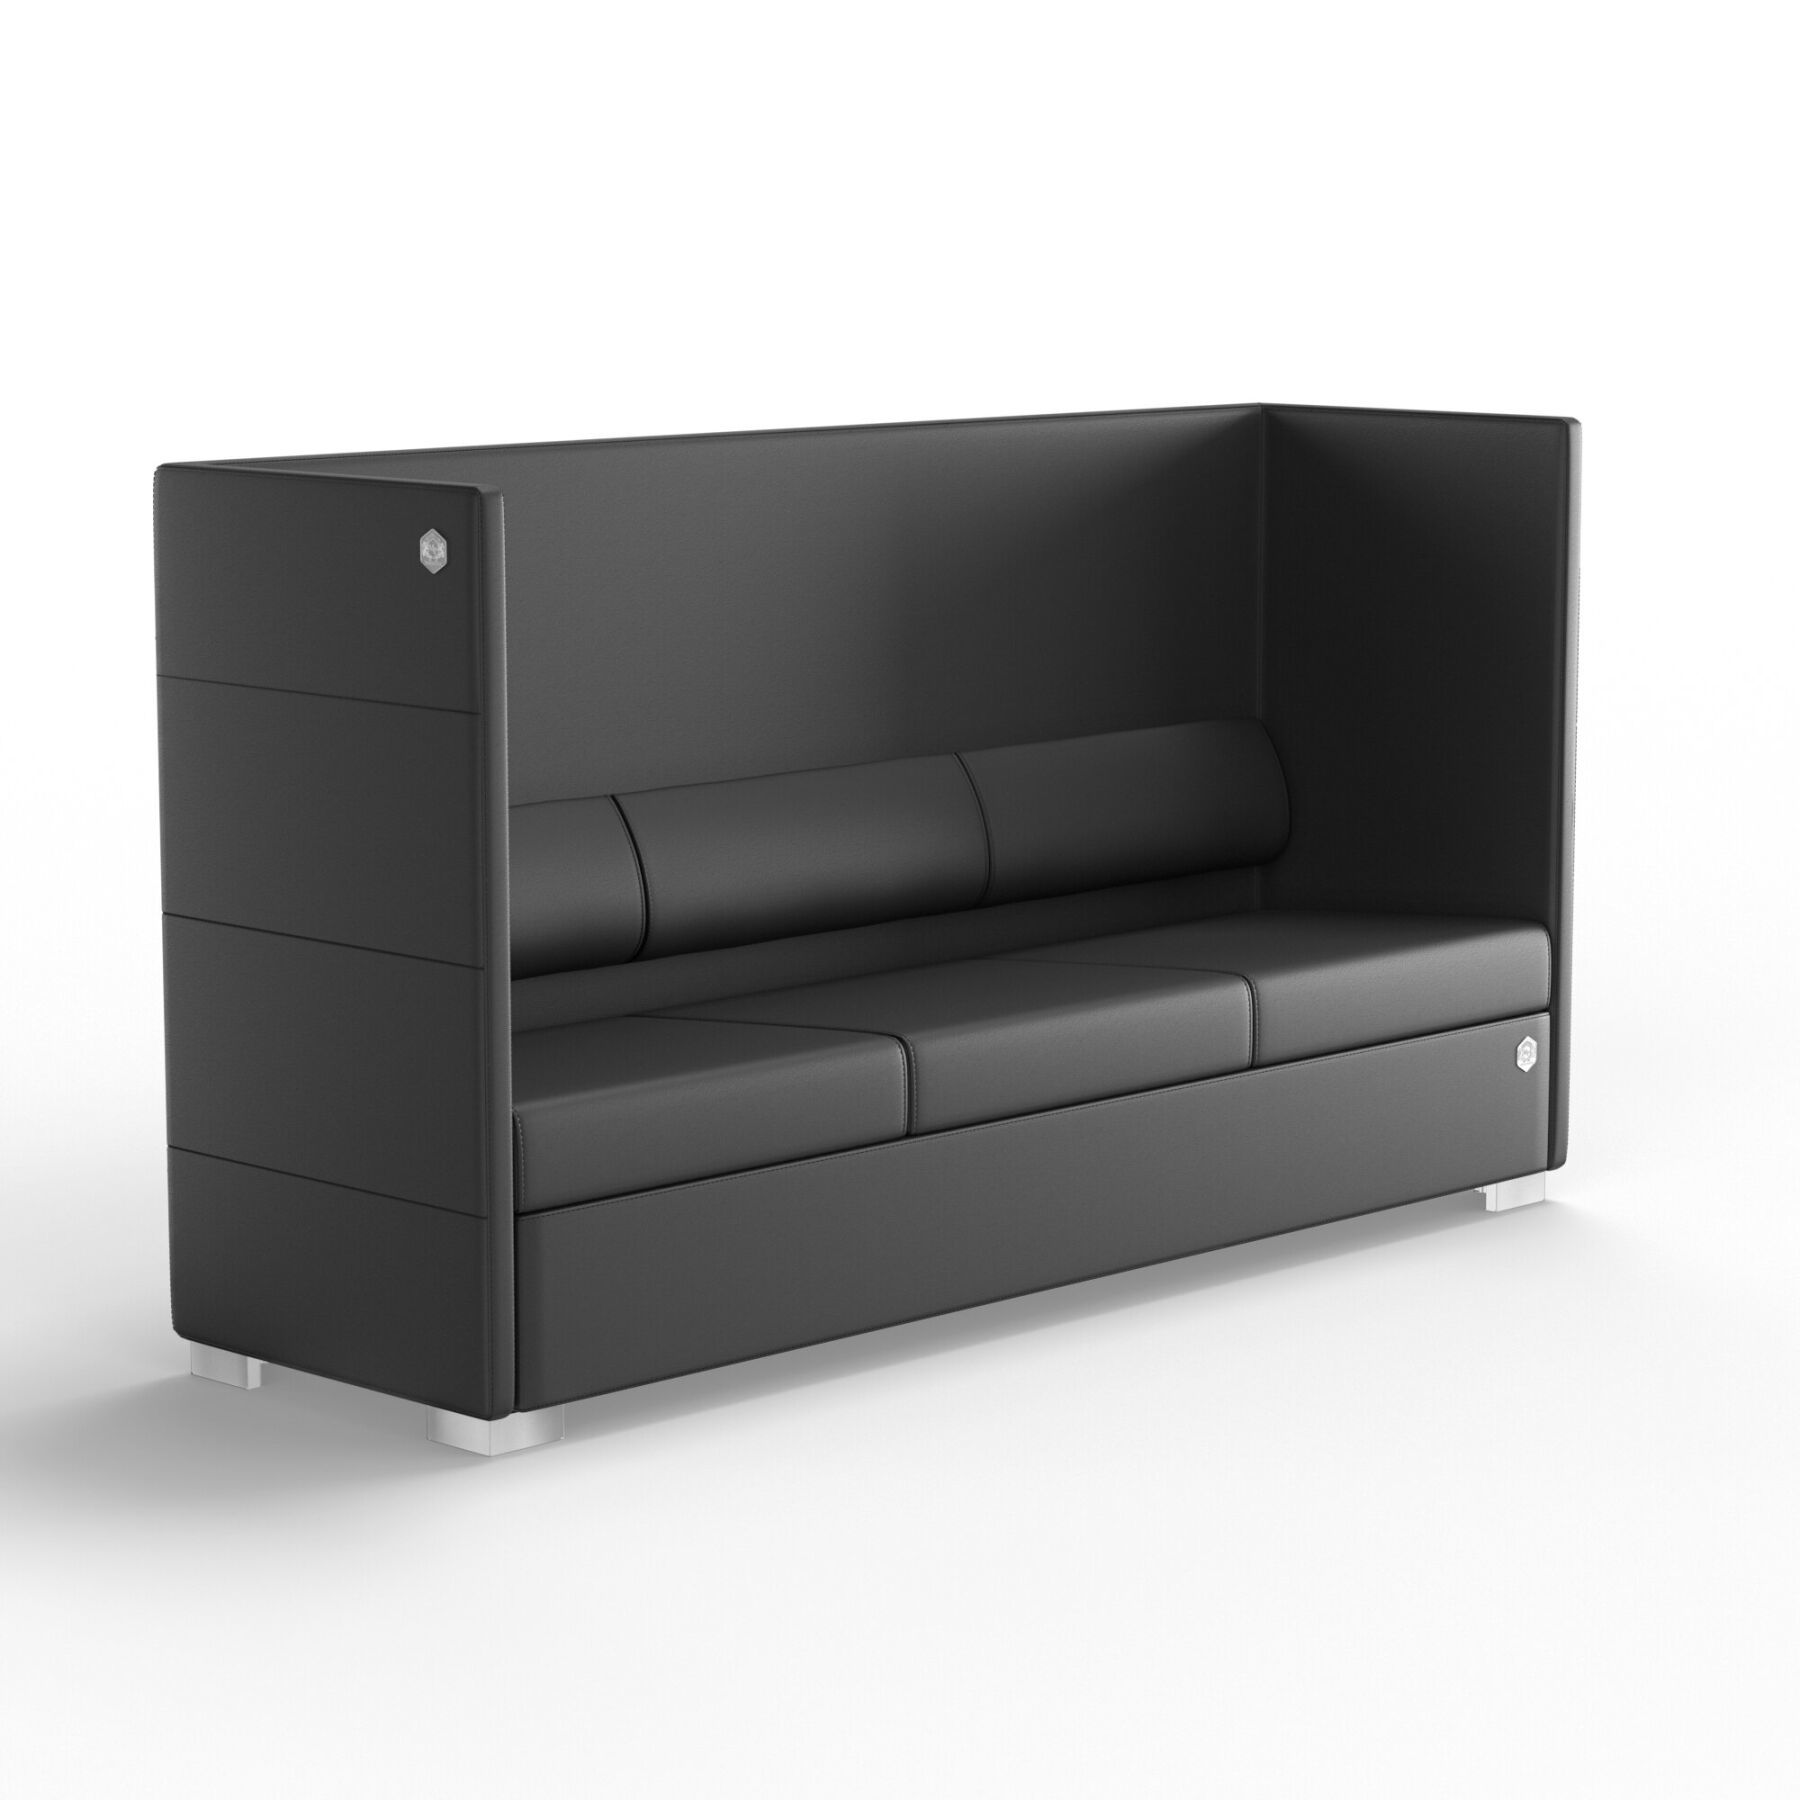 Трехместный диван KULIK SYSTEM PRIVATE Кожа 3